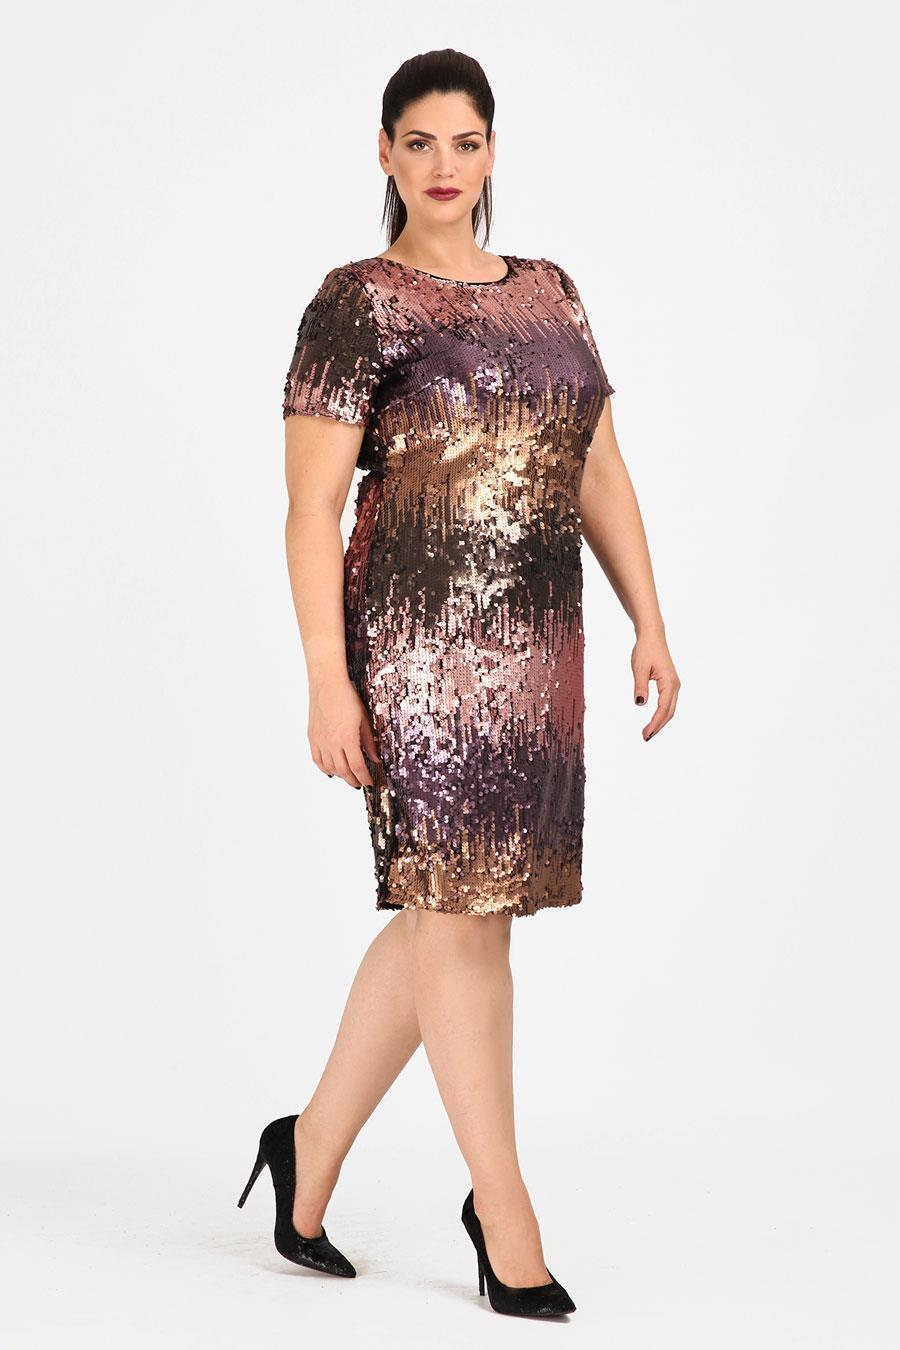 b81e6f5c9 vestidos moda primavera verano 2019 para gorditas lentejuelas. Vestido con  lentejuelas para tus looks de